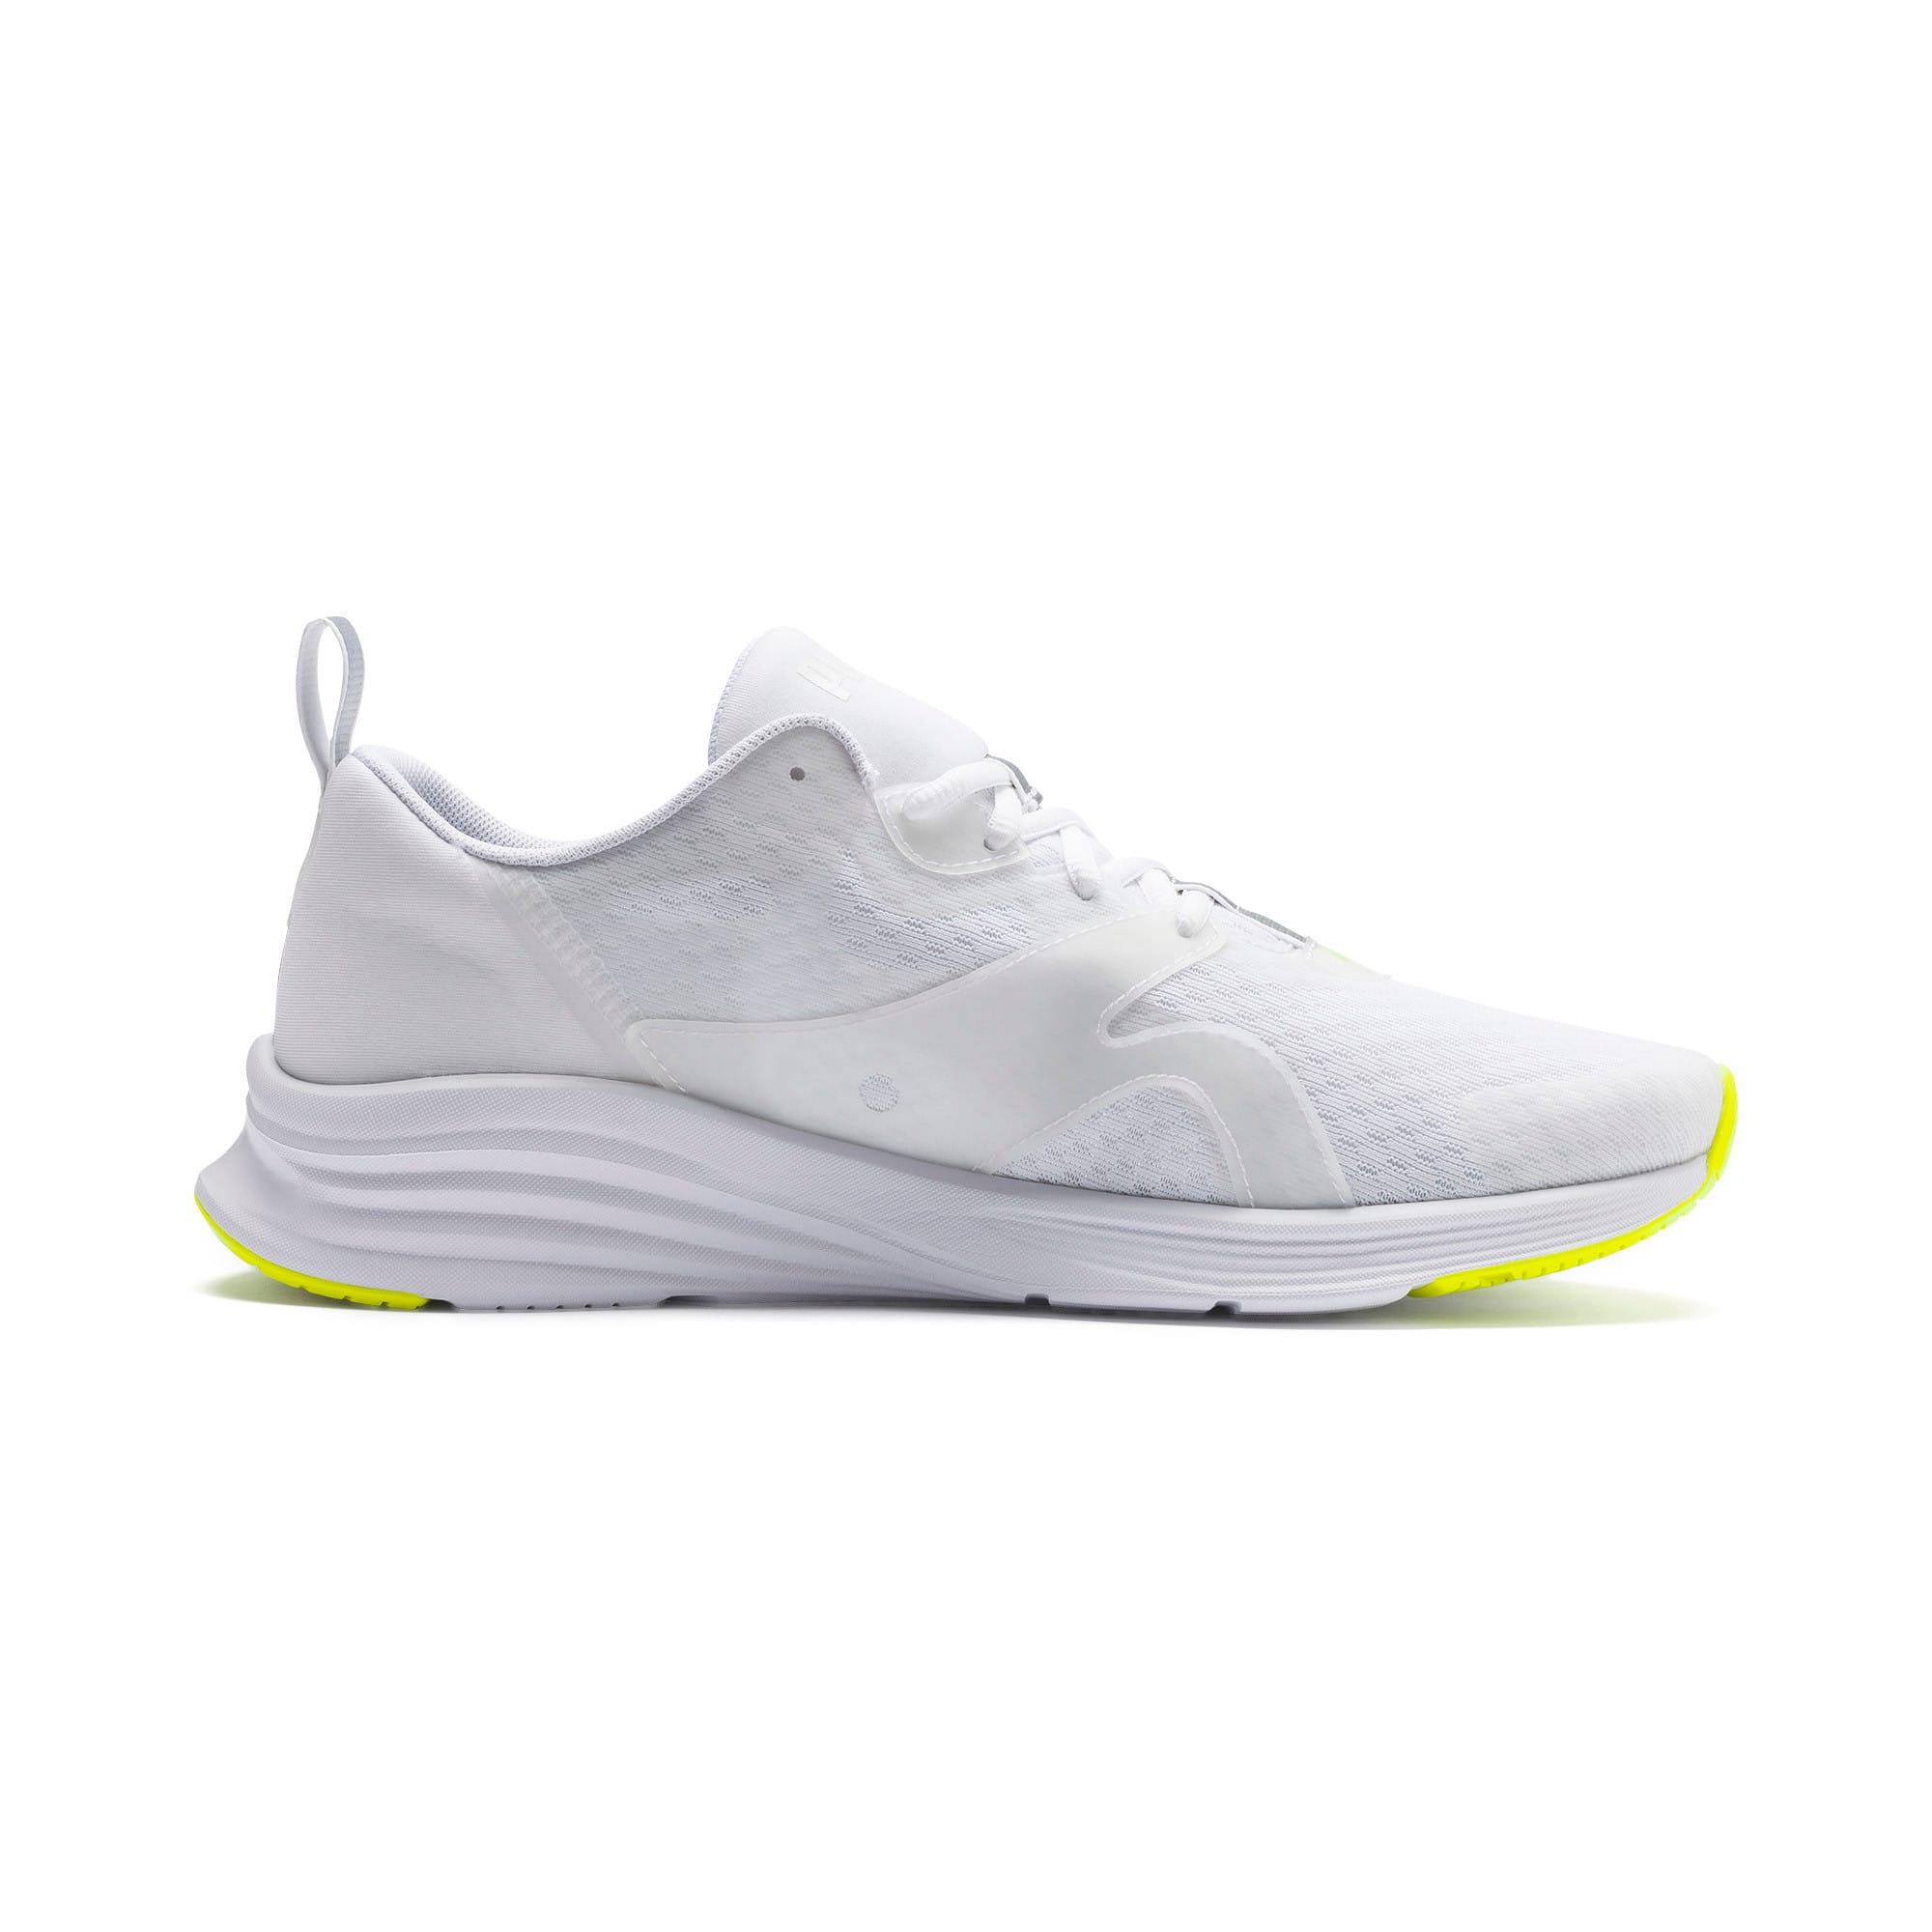 Thumbnail 6 of HYBRID Fuego Lights Men's Running Shoes, Puma White-Yellow Alert, medium